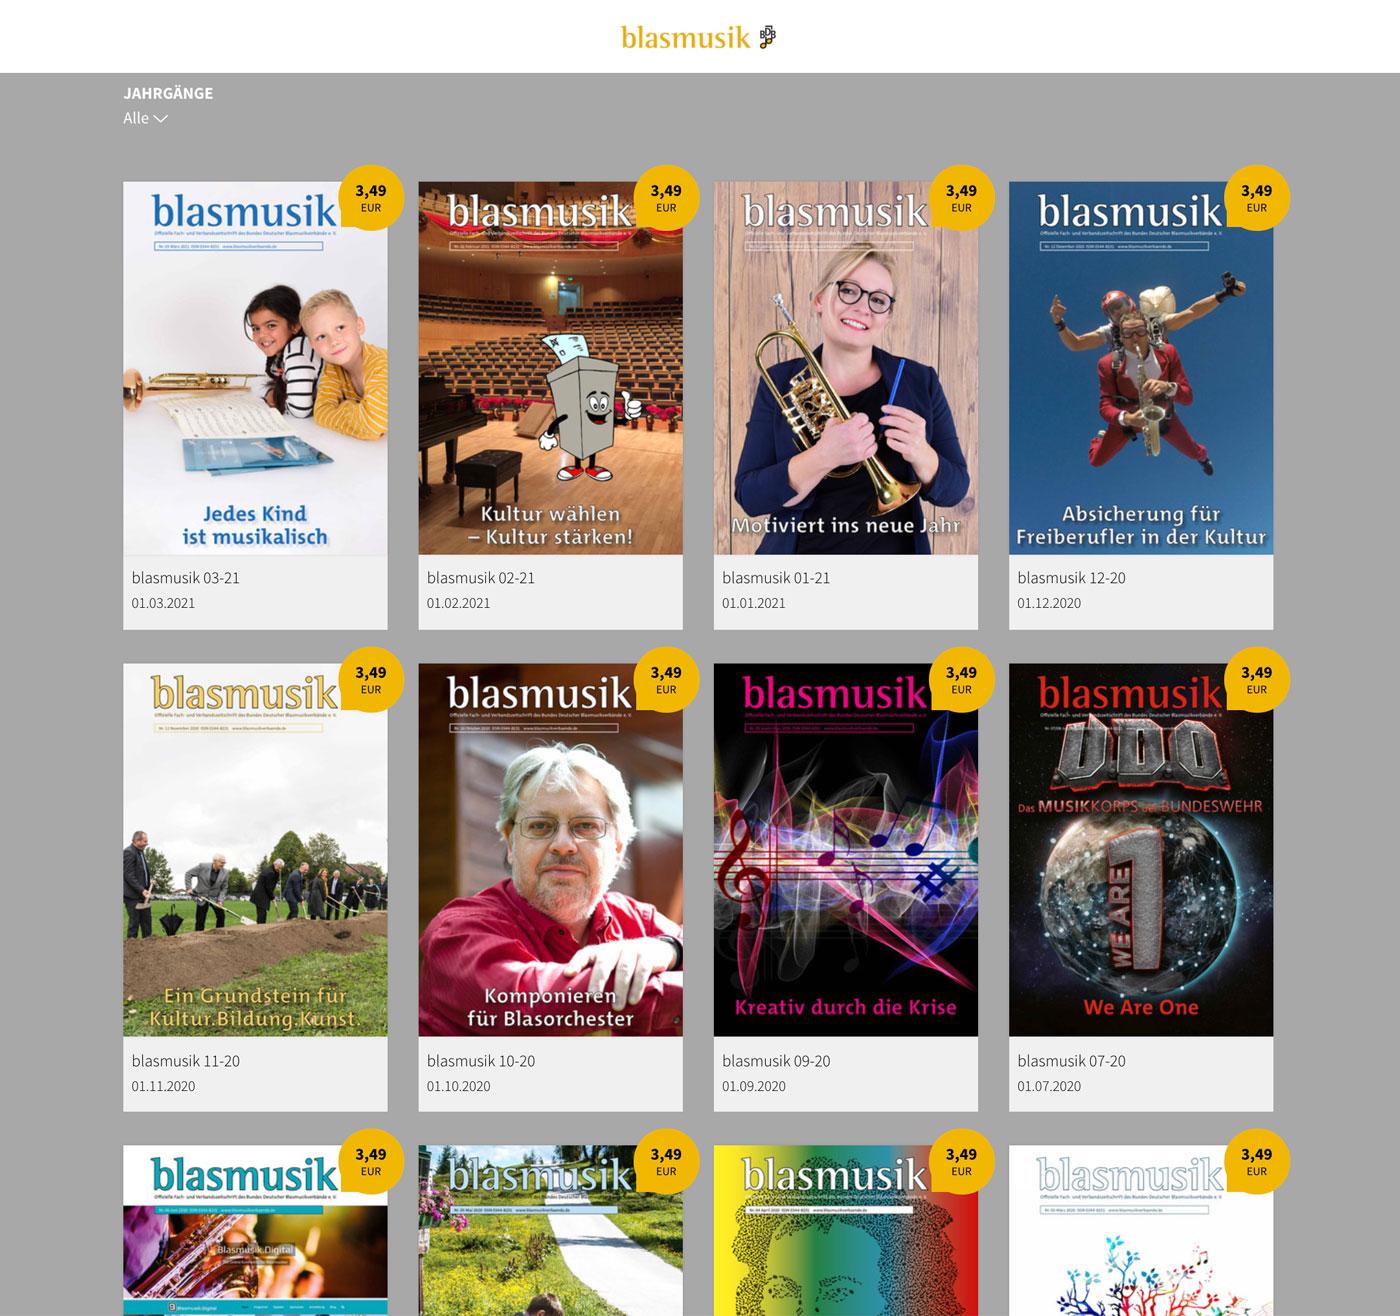 E-Paper Kiosk Zeitschrift blasmusik